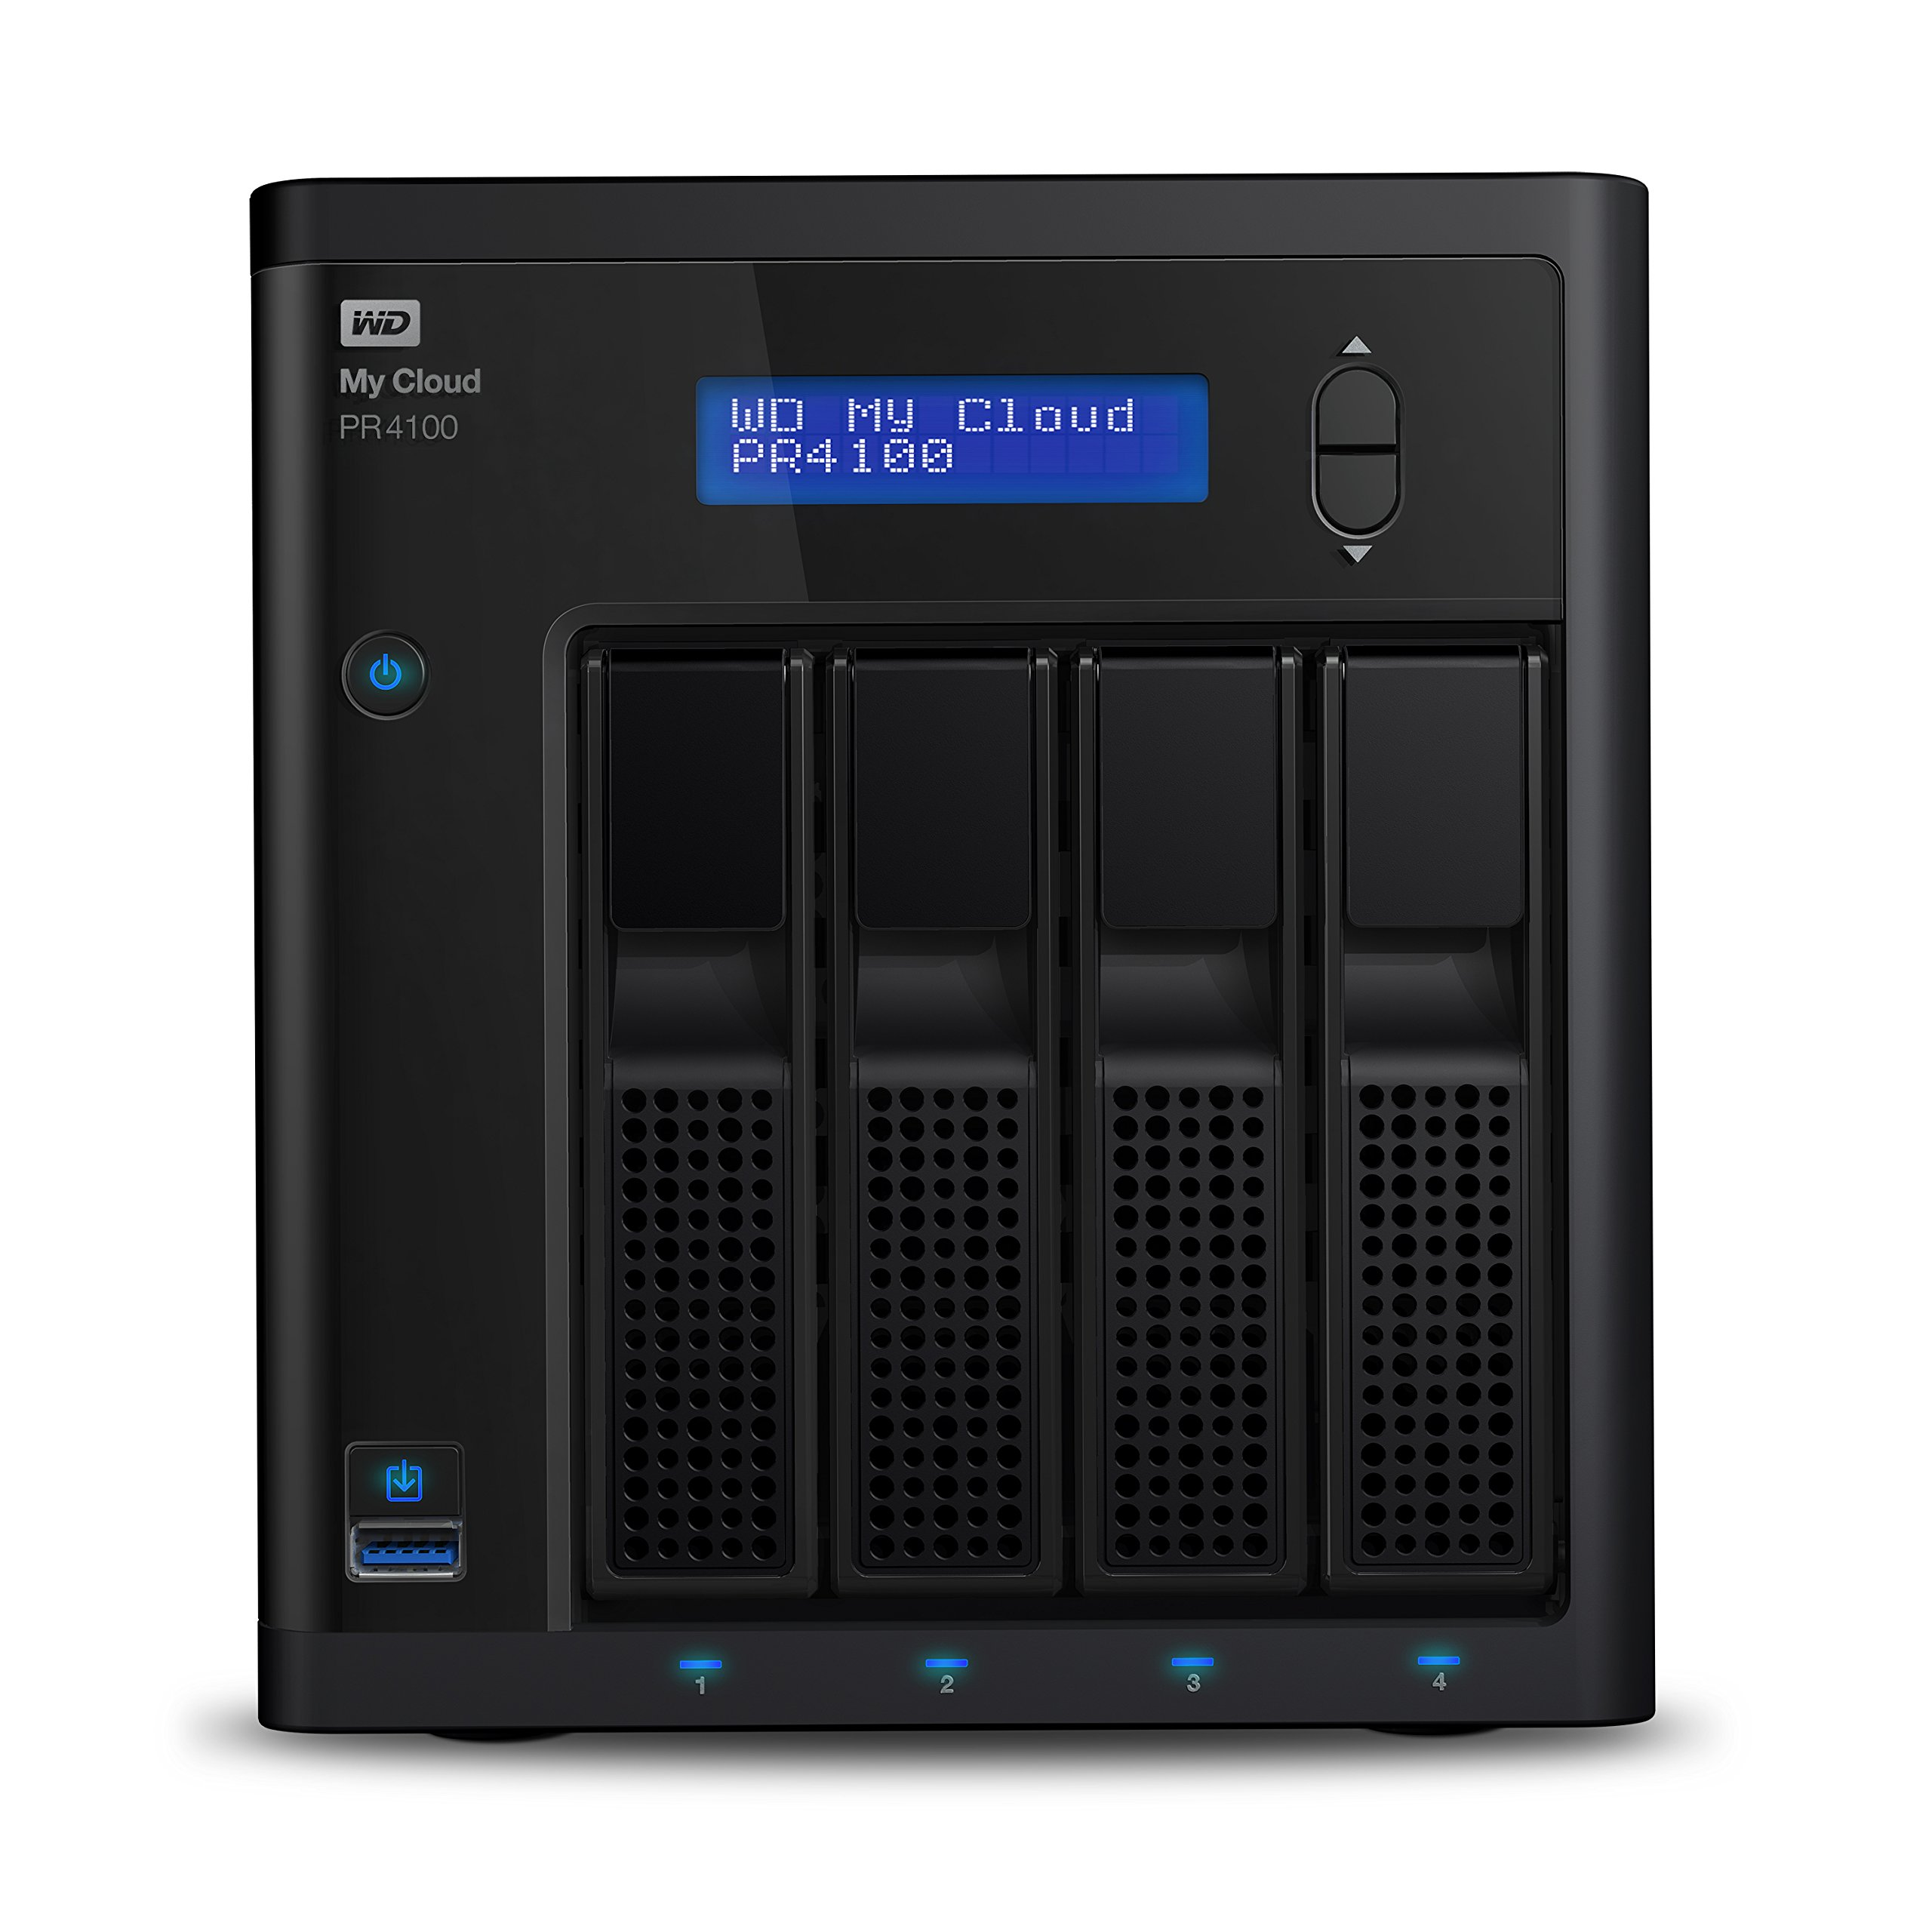 WD Diskless My CloudPro Series PR4100 Network Attached Storage - NAS - WDBNFA0000NBK-NESN by Western Digital